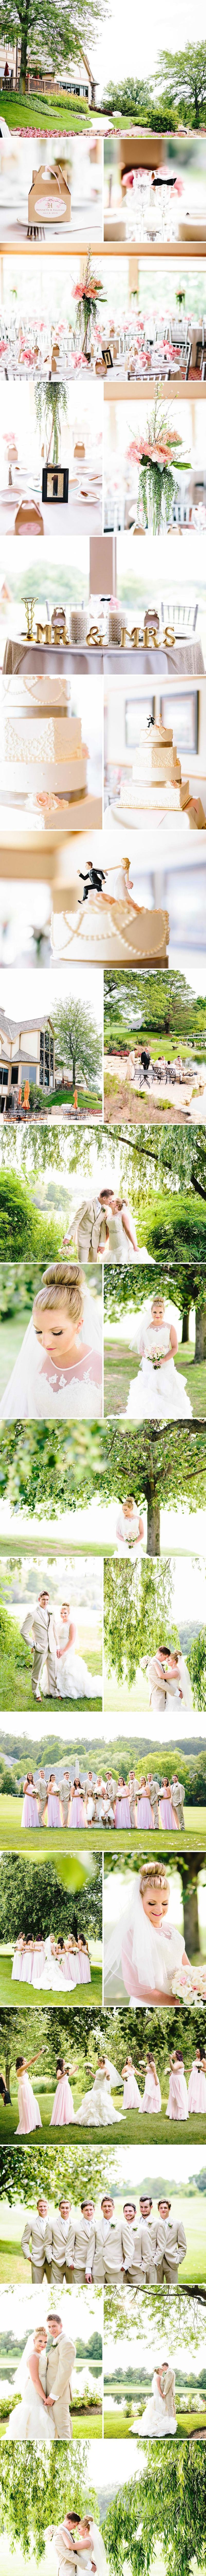 chicago-fine-art-wedding-photography-horney3